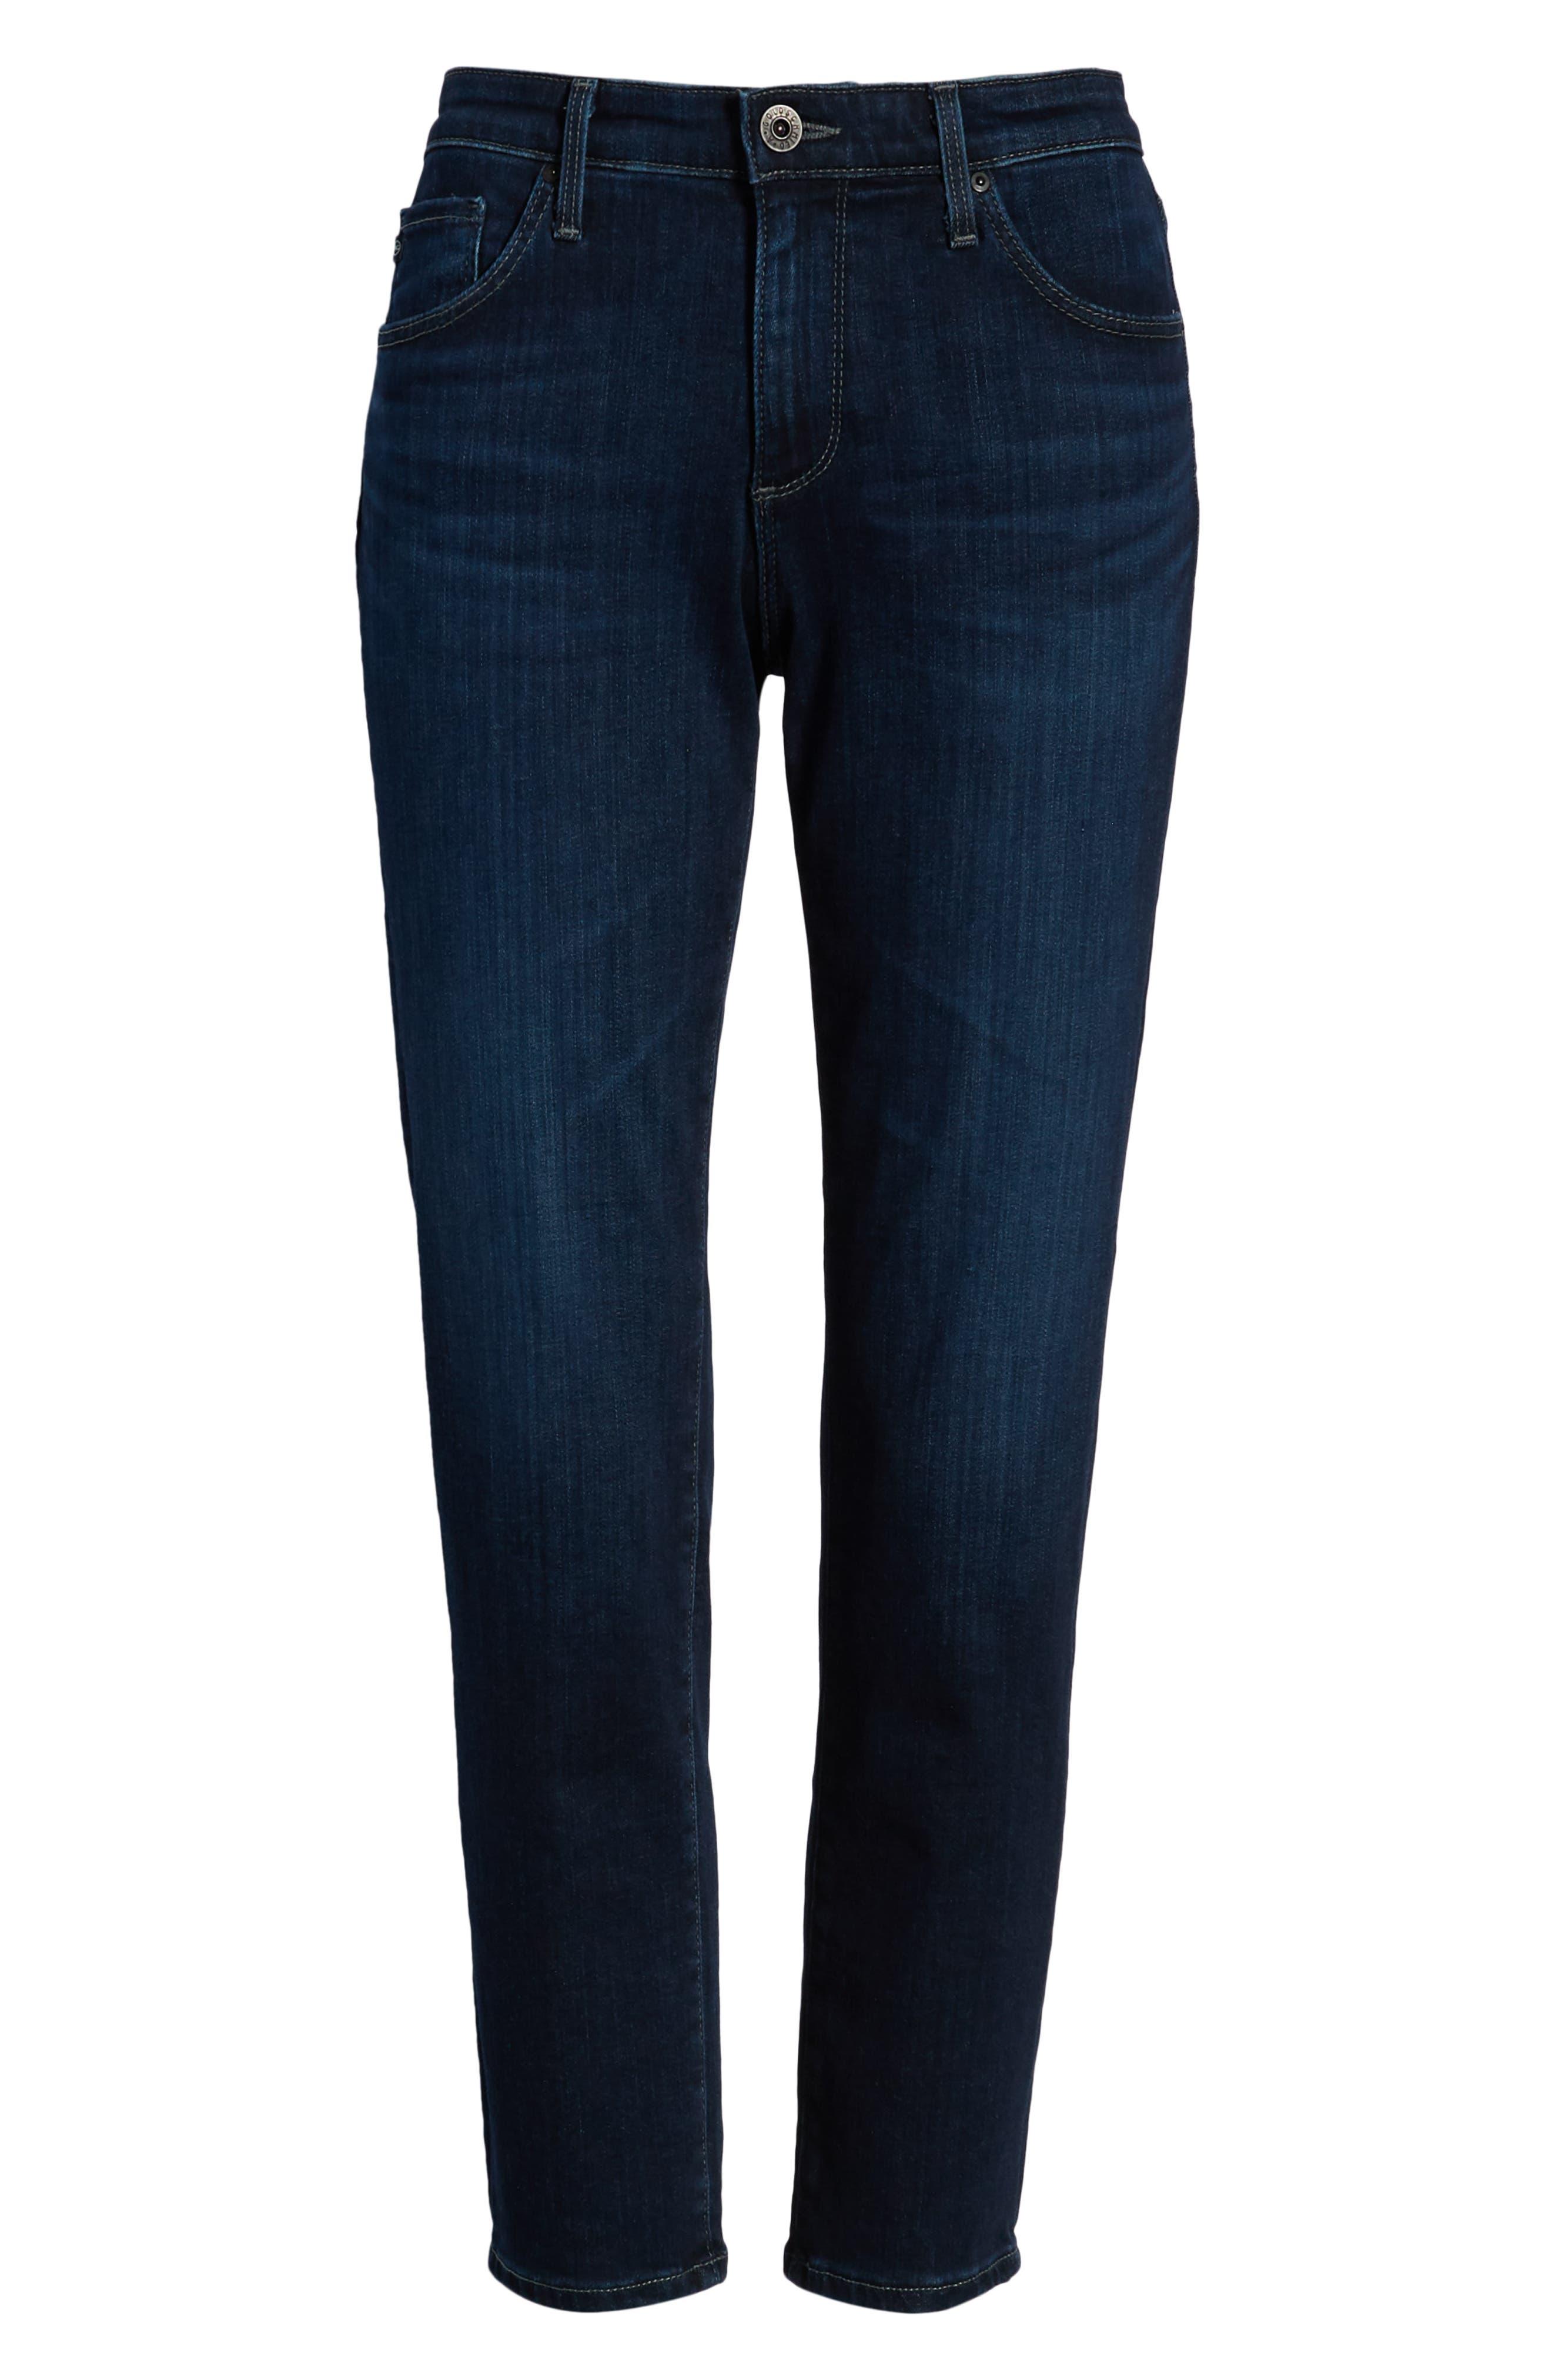 Ag Jeans The Prima Crop Cigarette Jeans